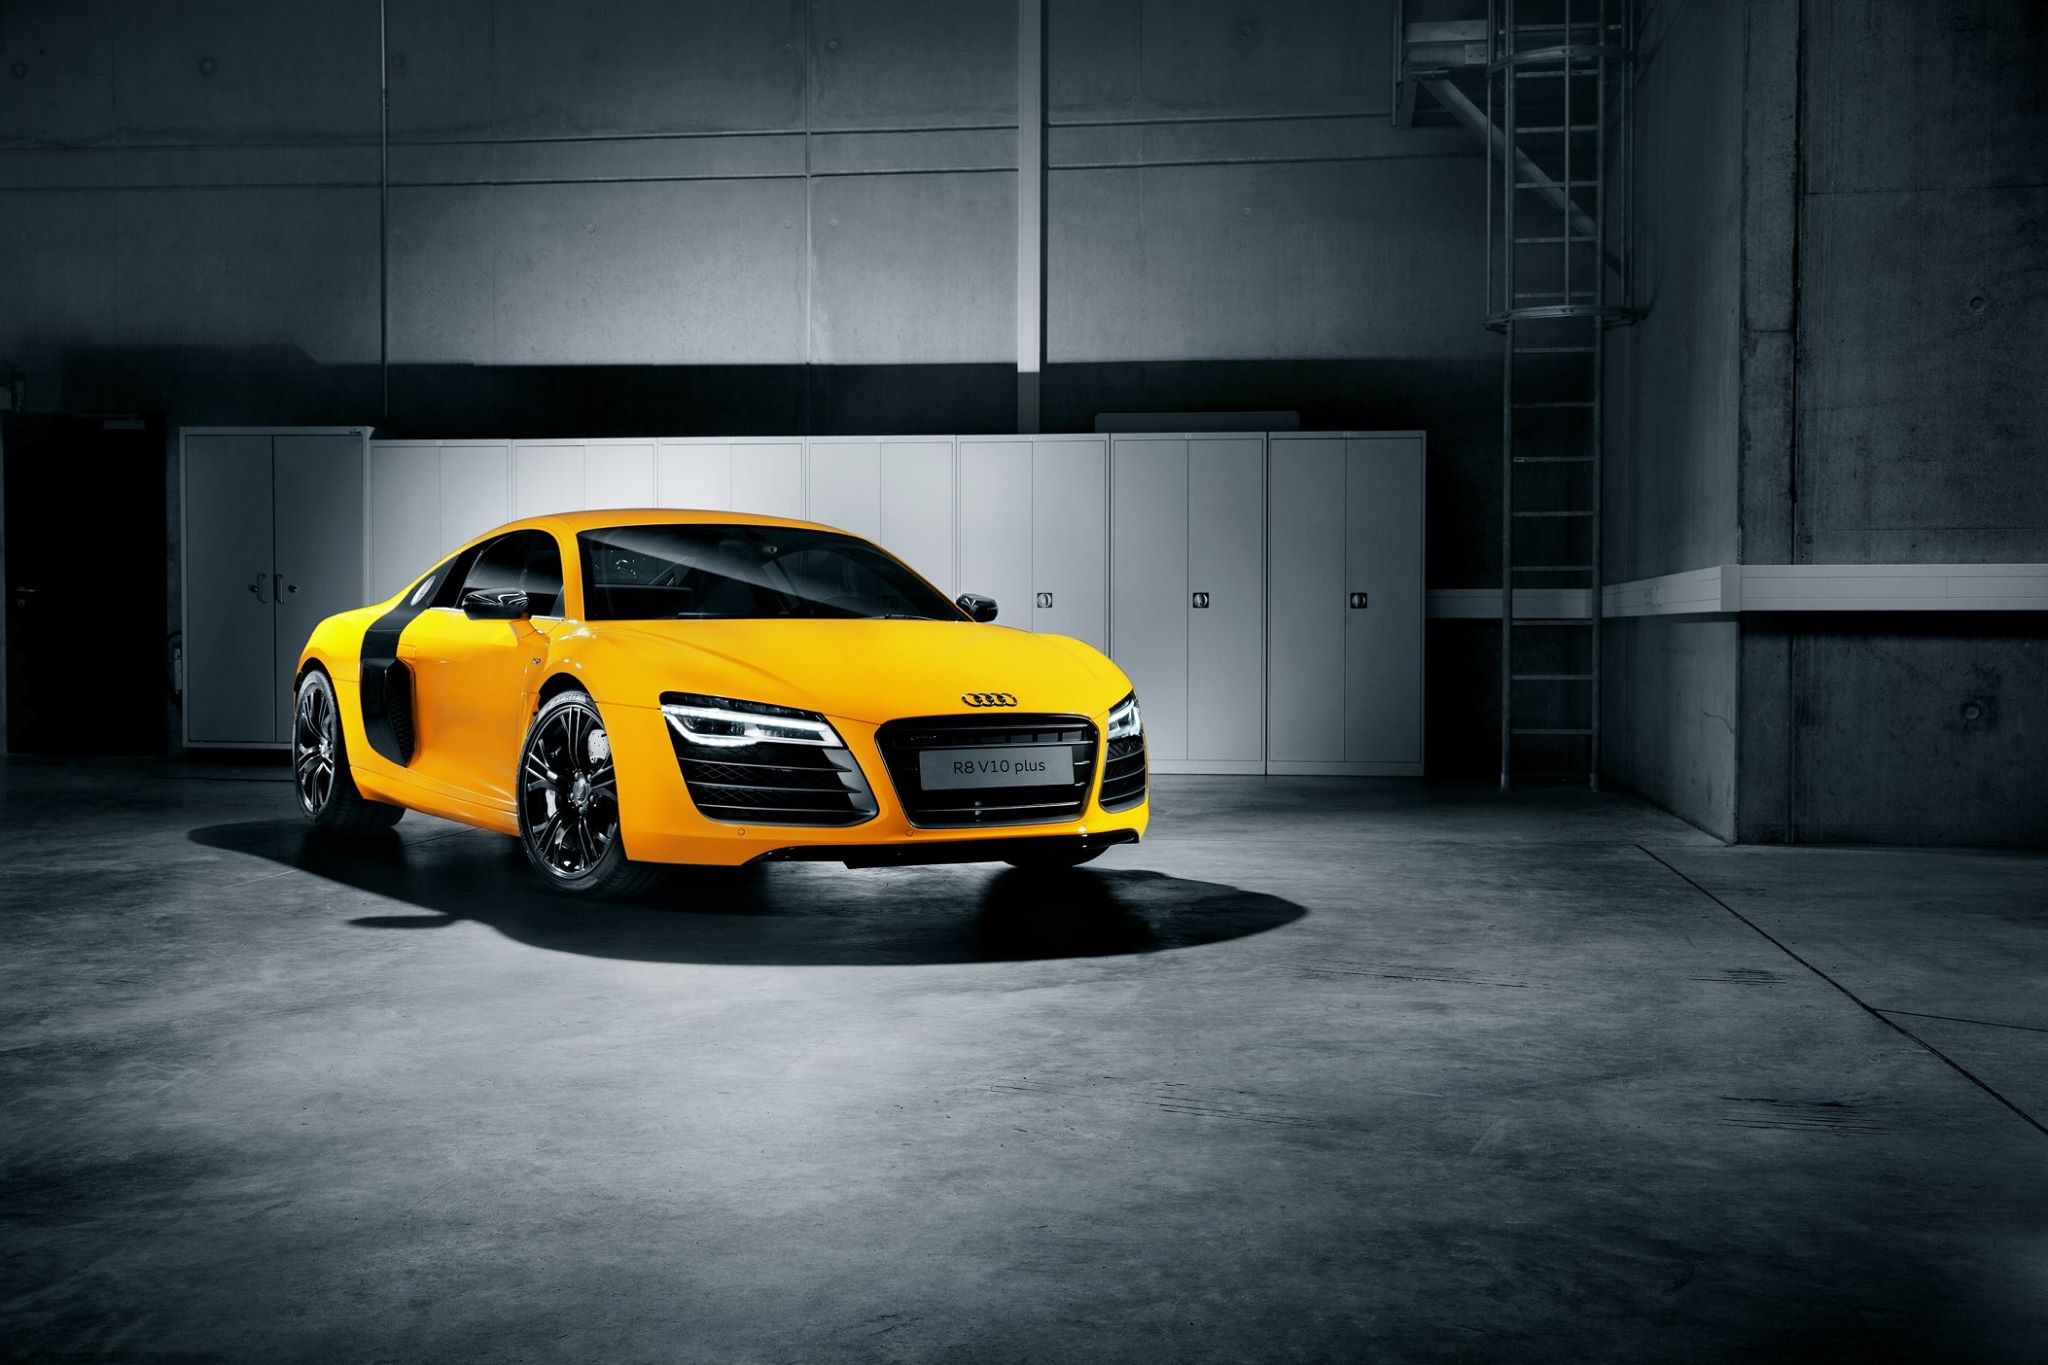 Vegas Yellow Audi R8 V10 Plus With Carbon Inserts Autoevolution